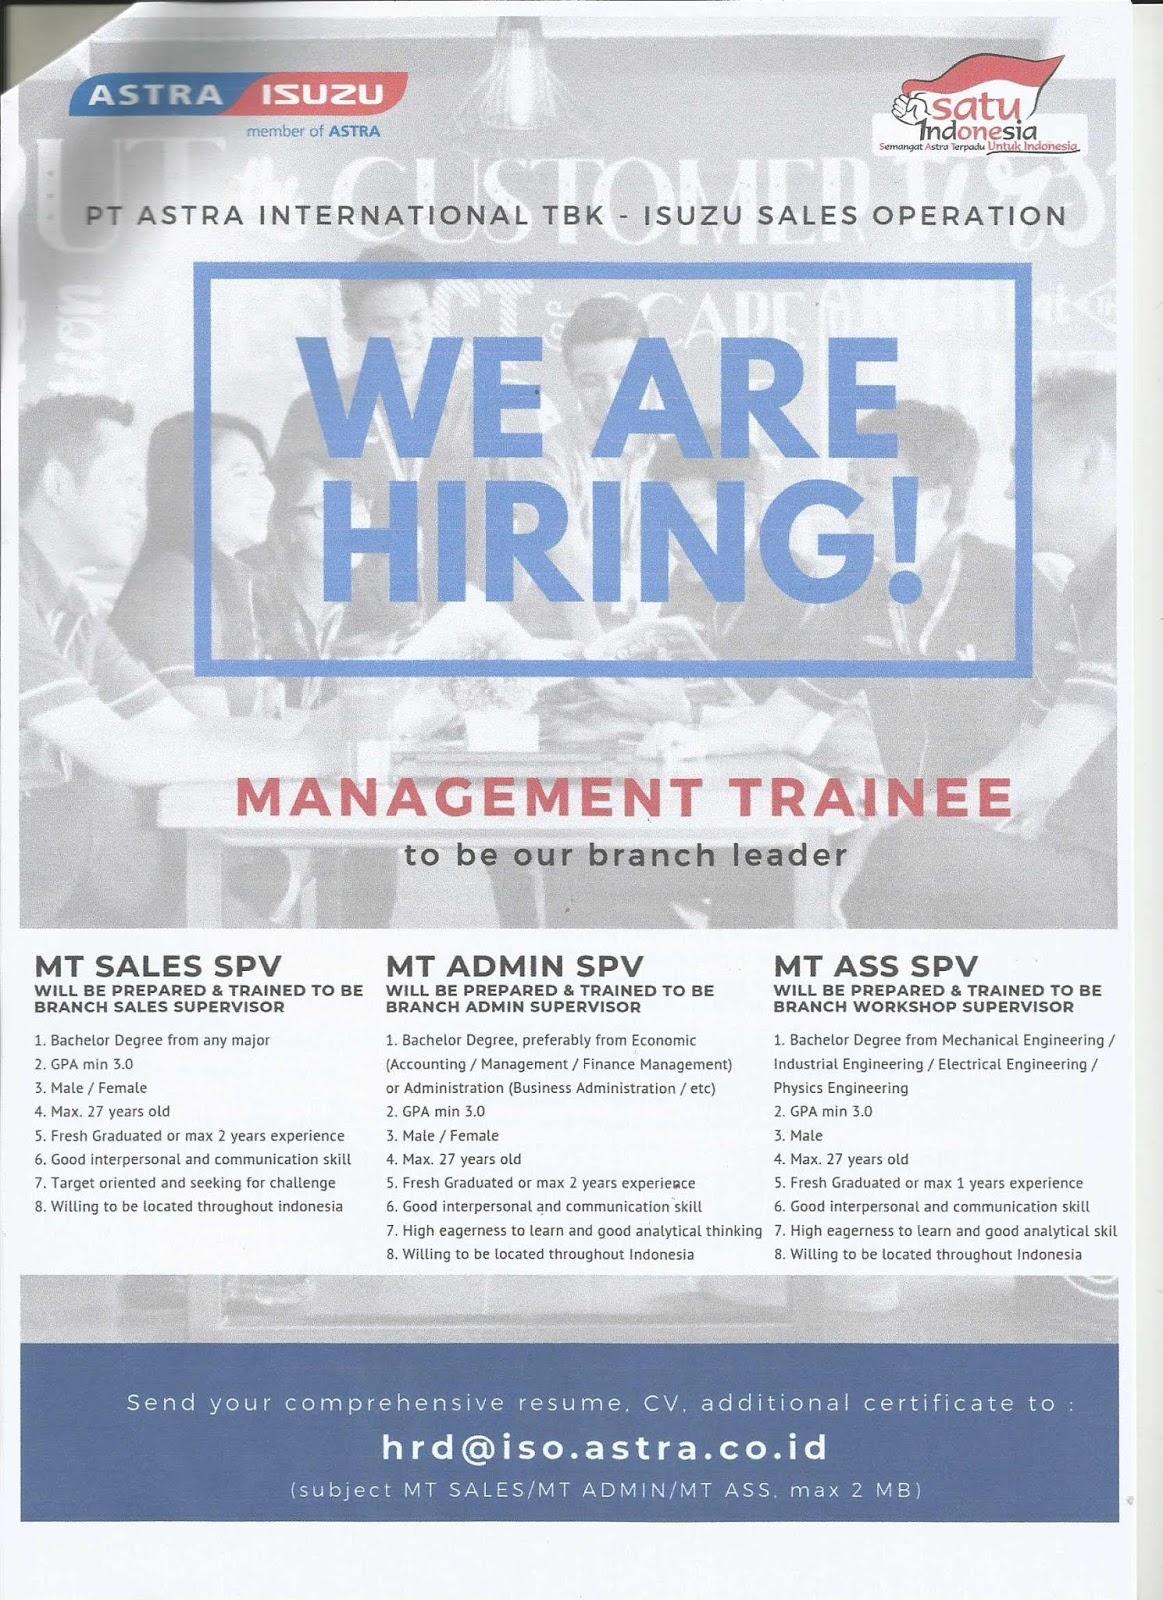 Lowongan Kerja PT Astra International Tbk – Isuzu Sales Operation Tingkat S1 Semua Jurusan Agustus 2019